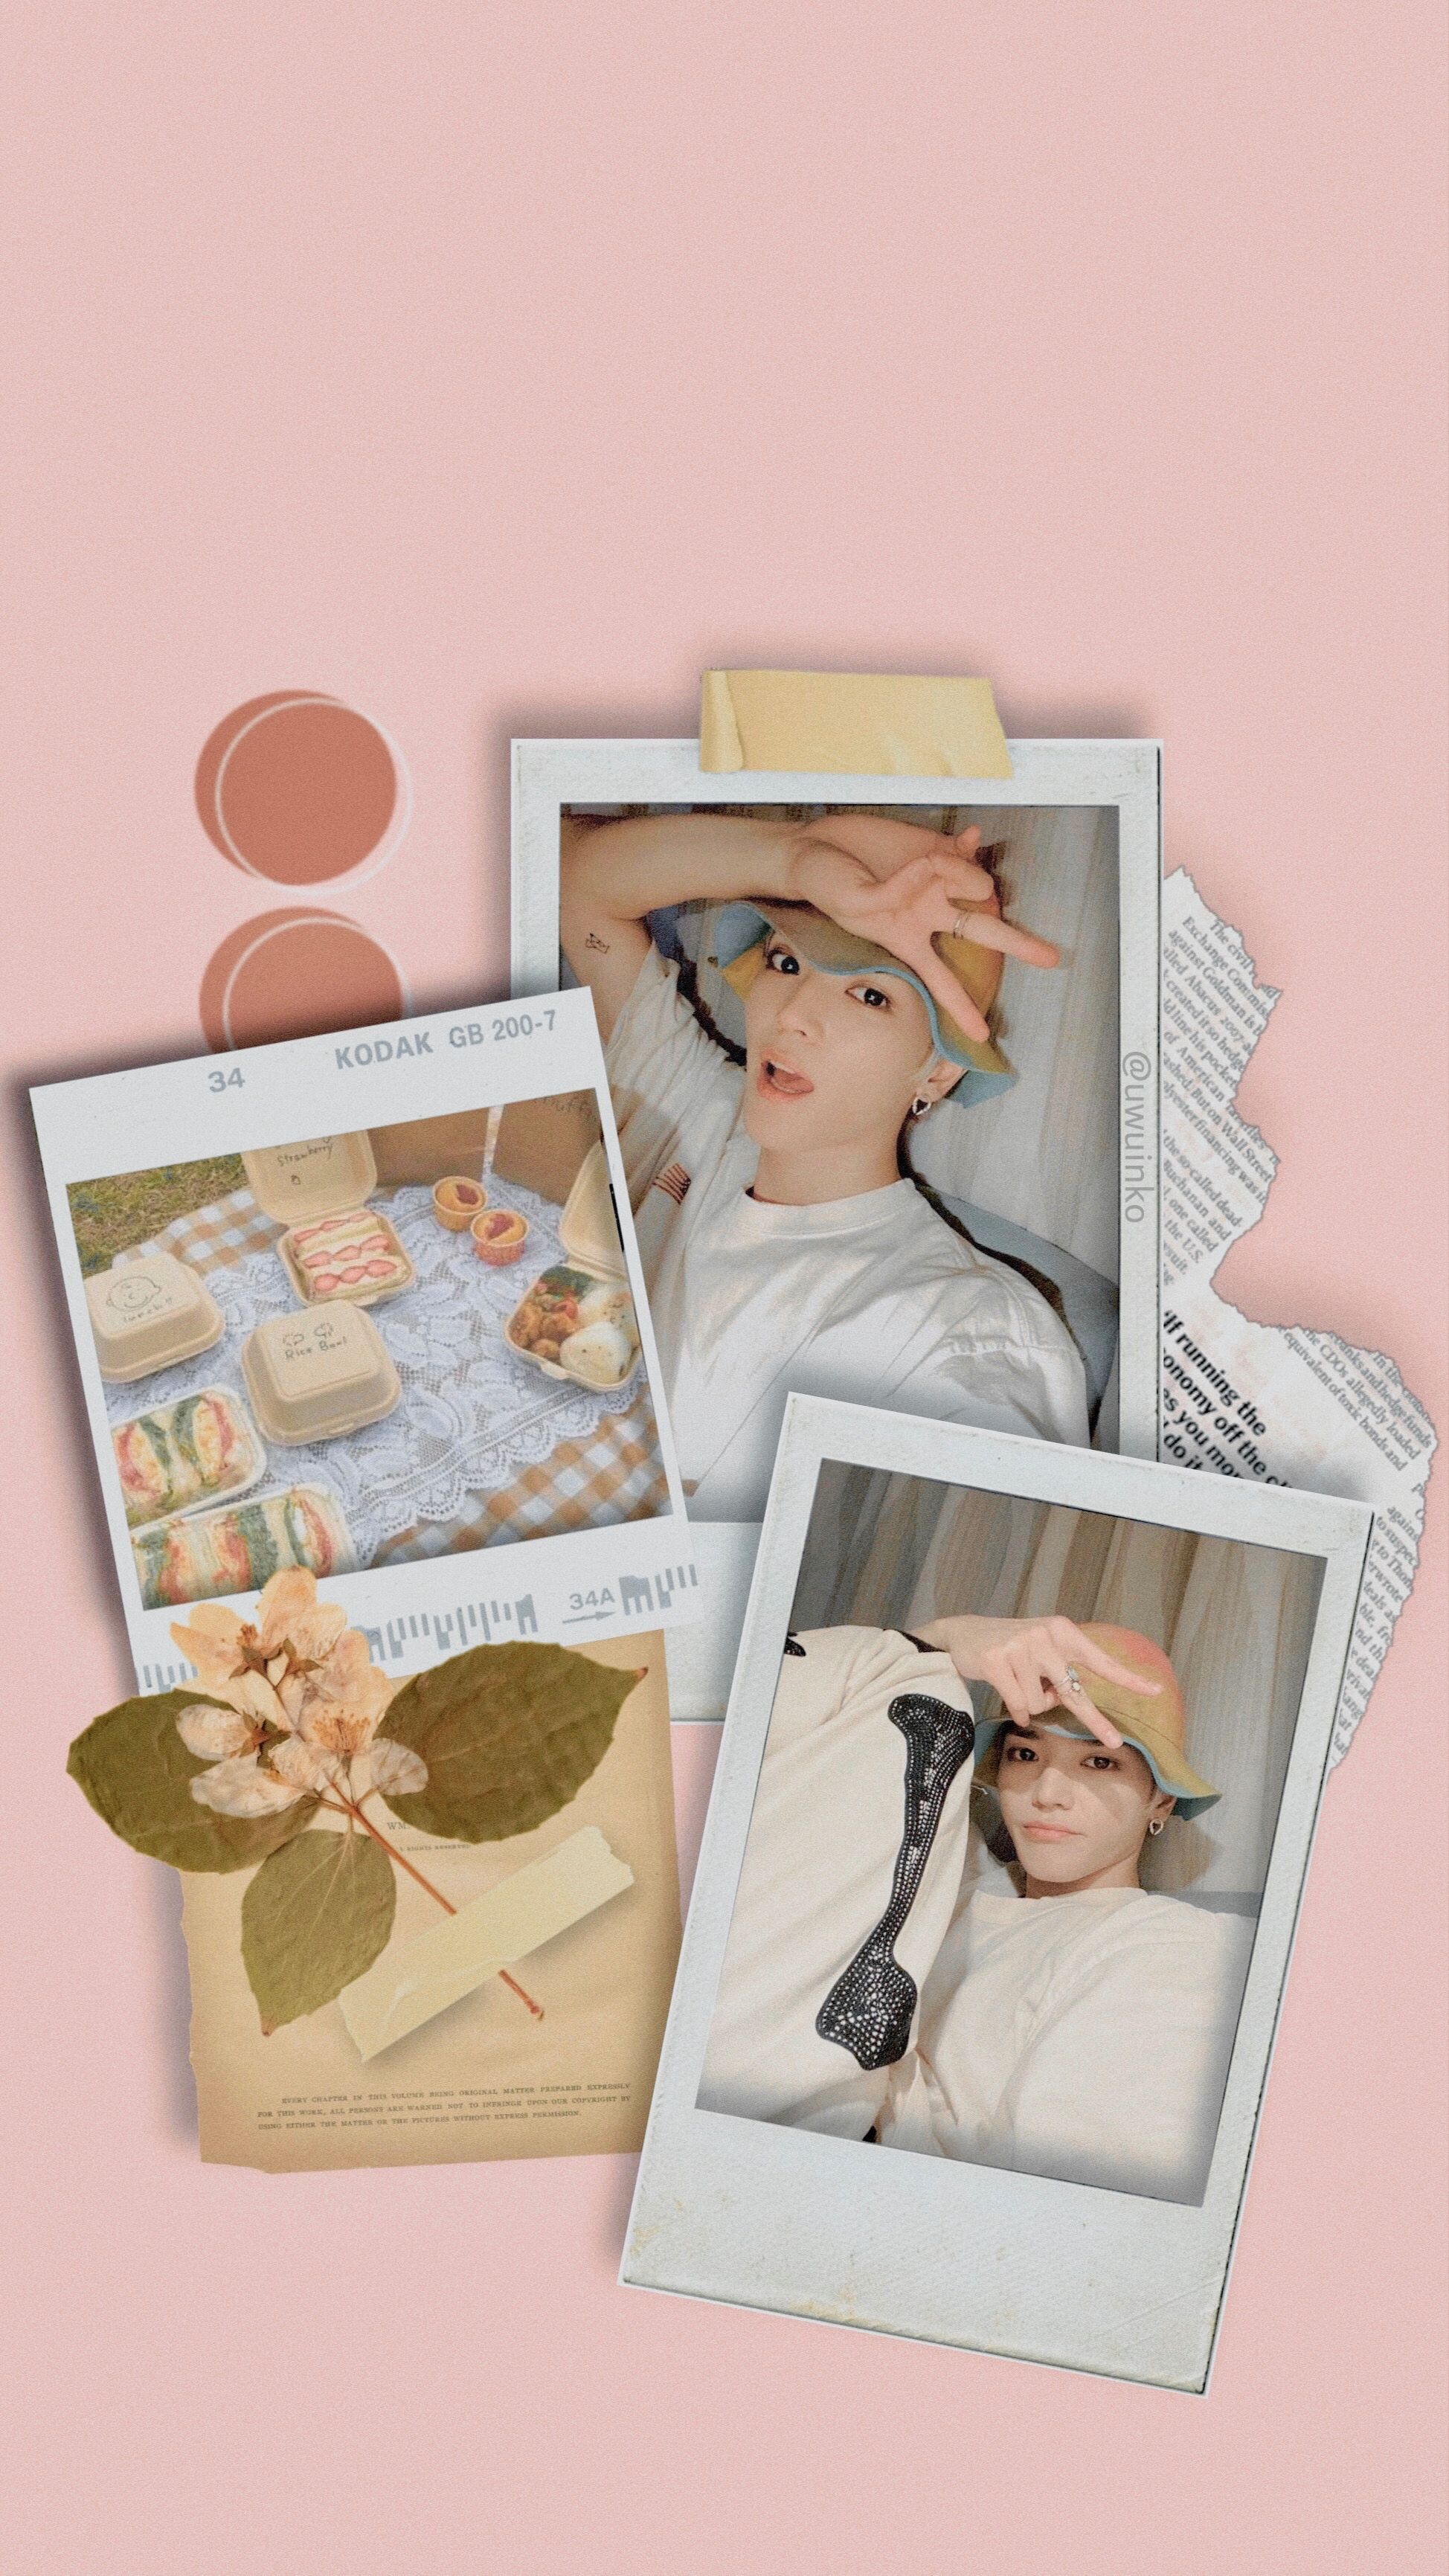 Taeyong Aesthetic Wallpaper In 2020 Taeyong Nct Taeyong Jeno Nct